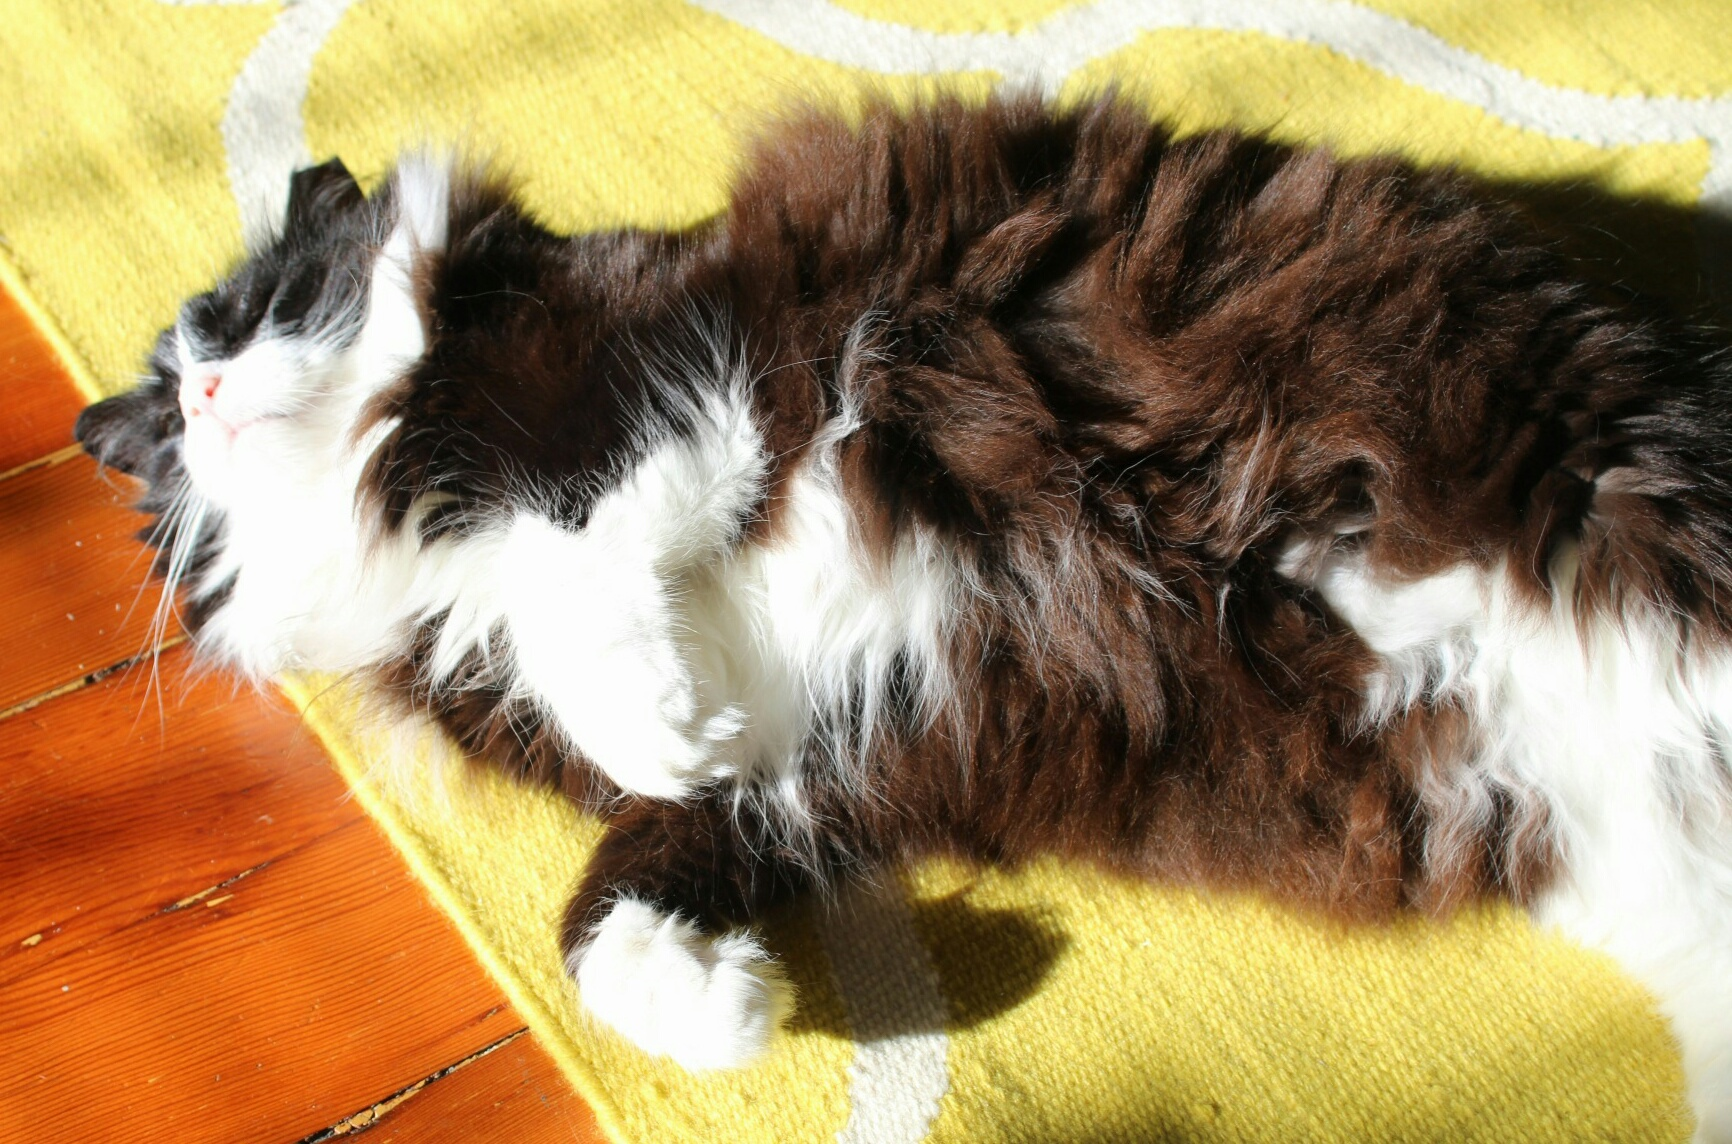 mo-cat-parsnip-3.jpg